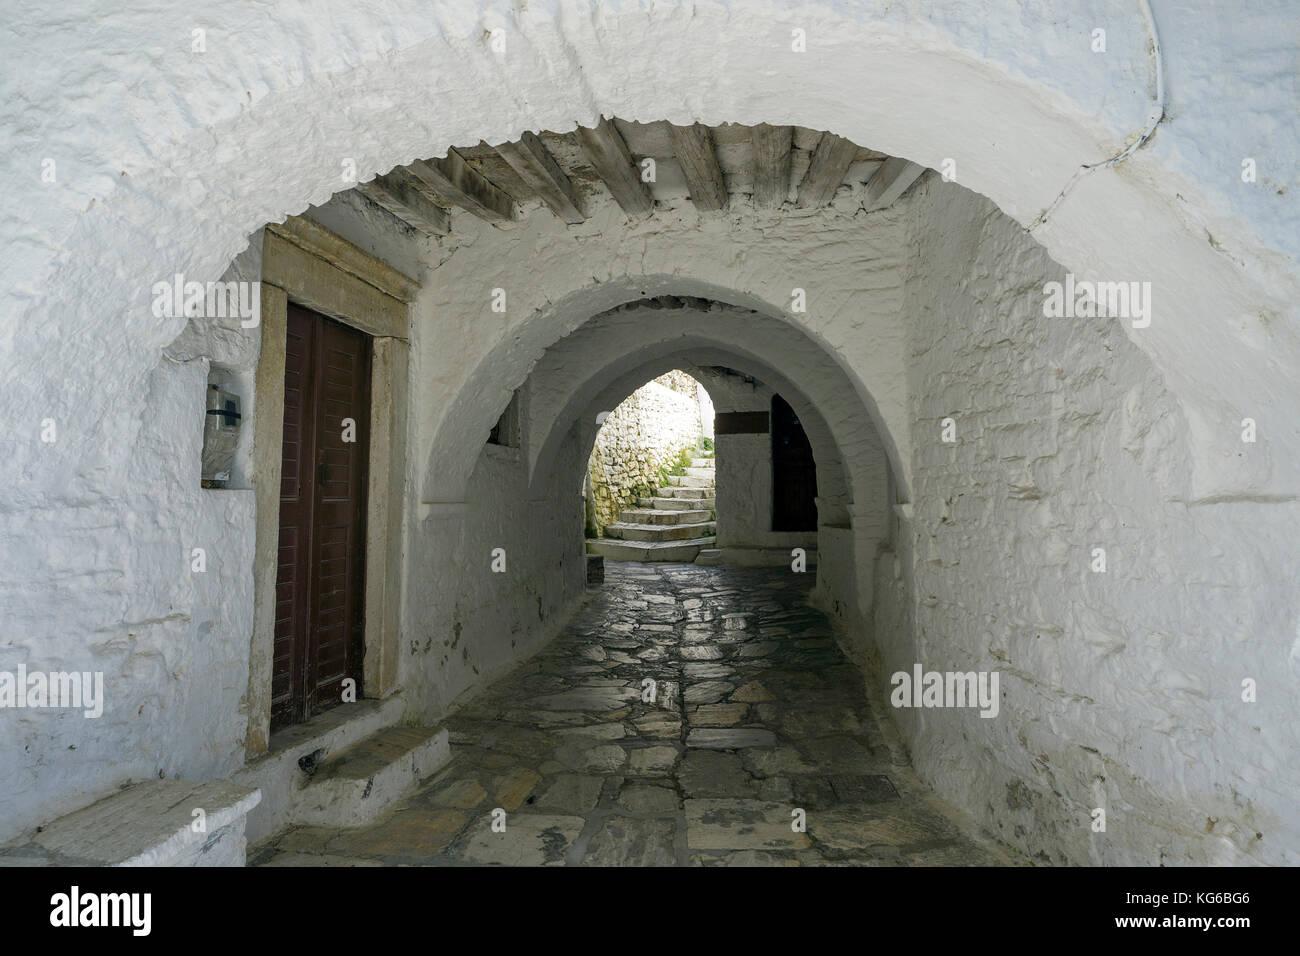 Passage at the mountain village Apiranthos, Naxos island, Cyclades, Aegean, Greece Stock Photo